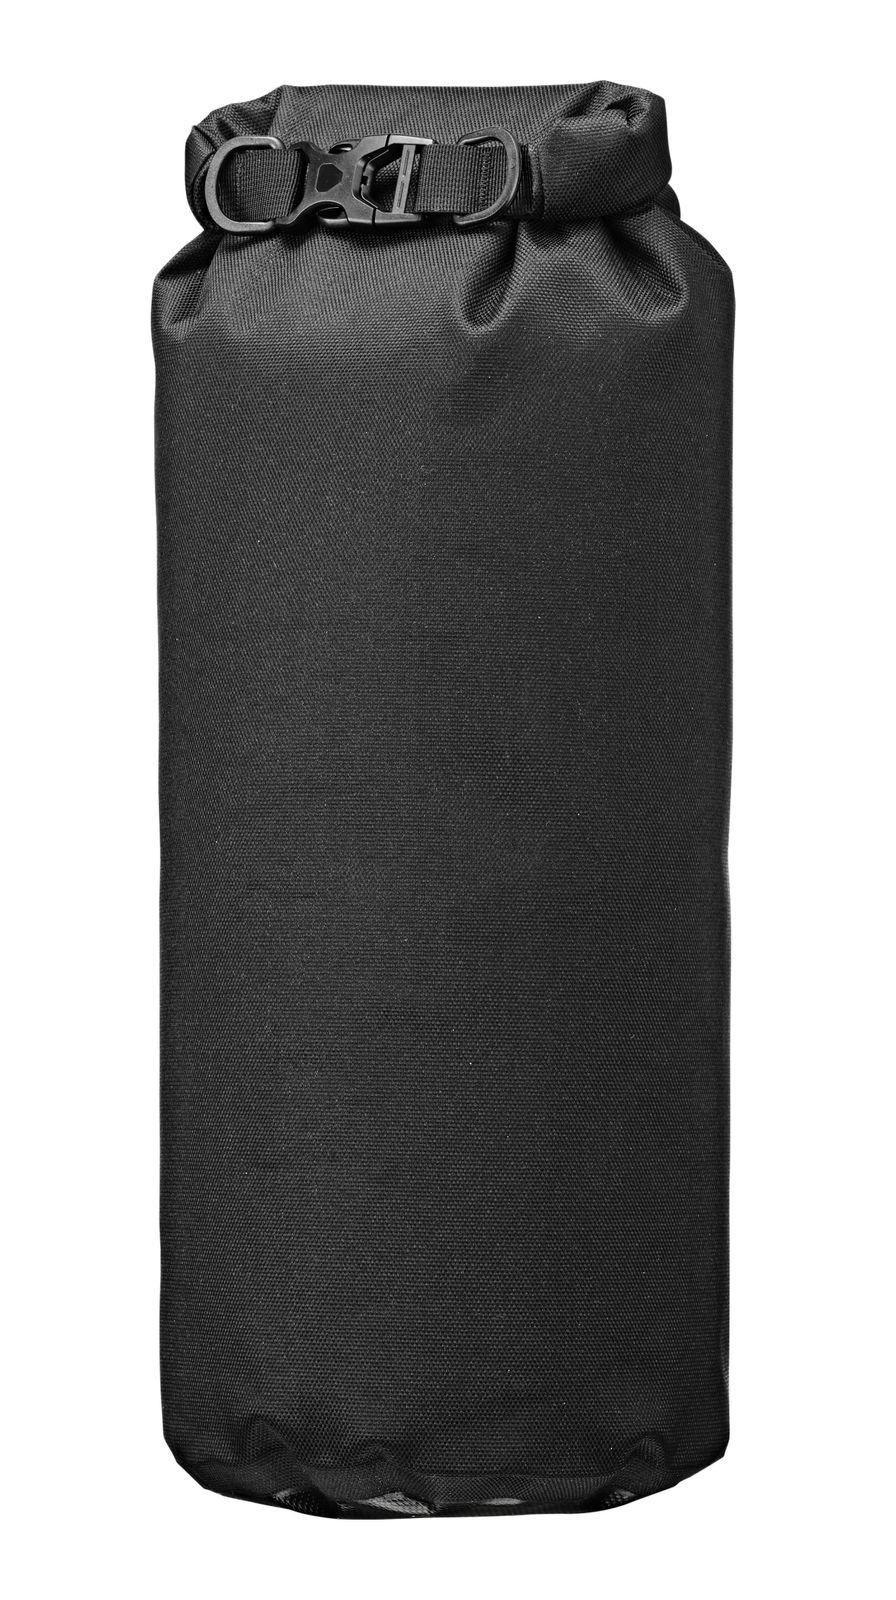 ORTLIEB Dry-Bag PS490 13L Black-Grey